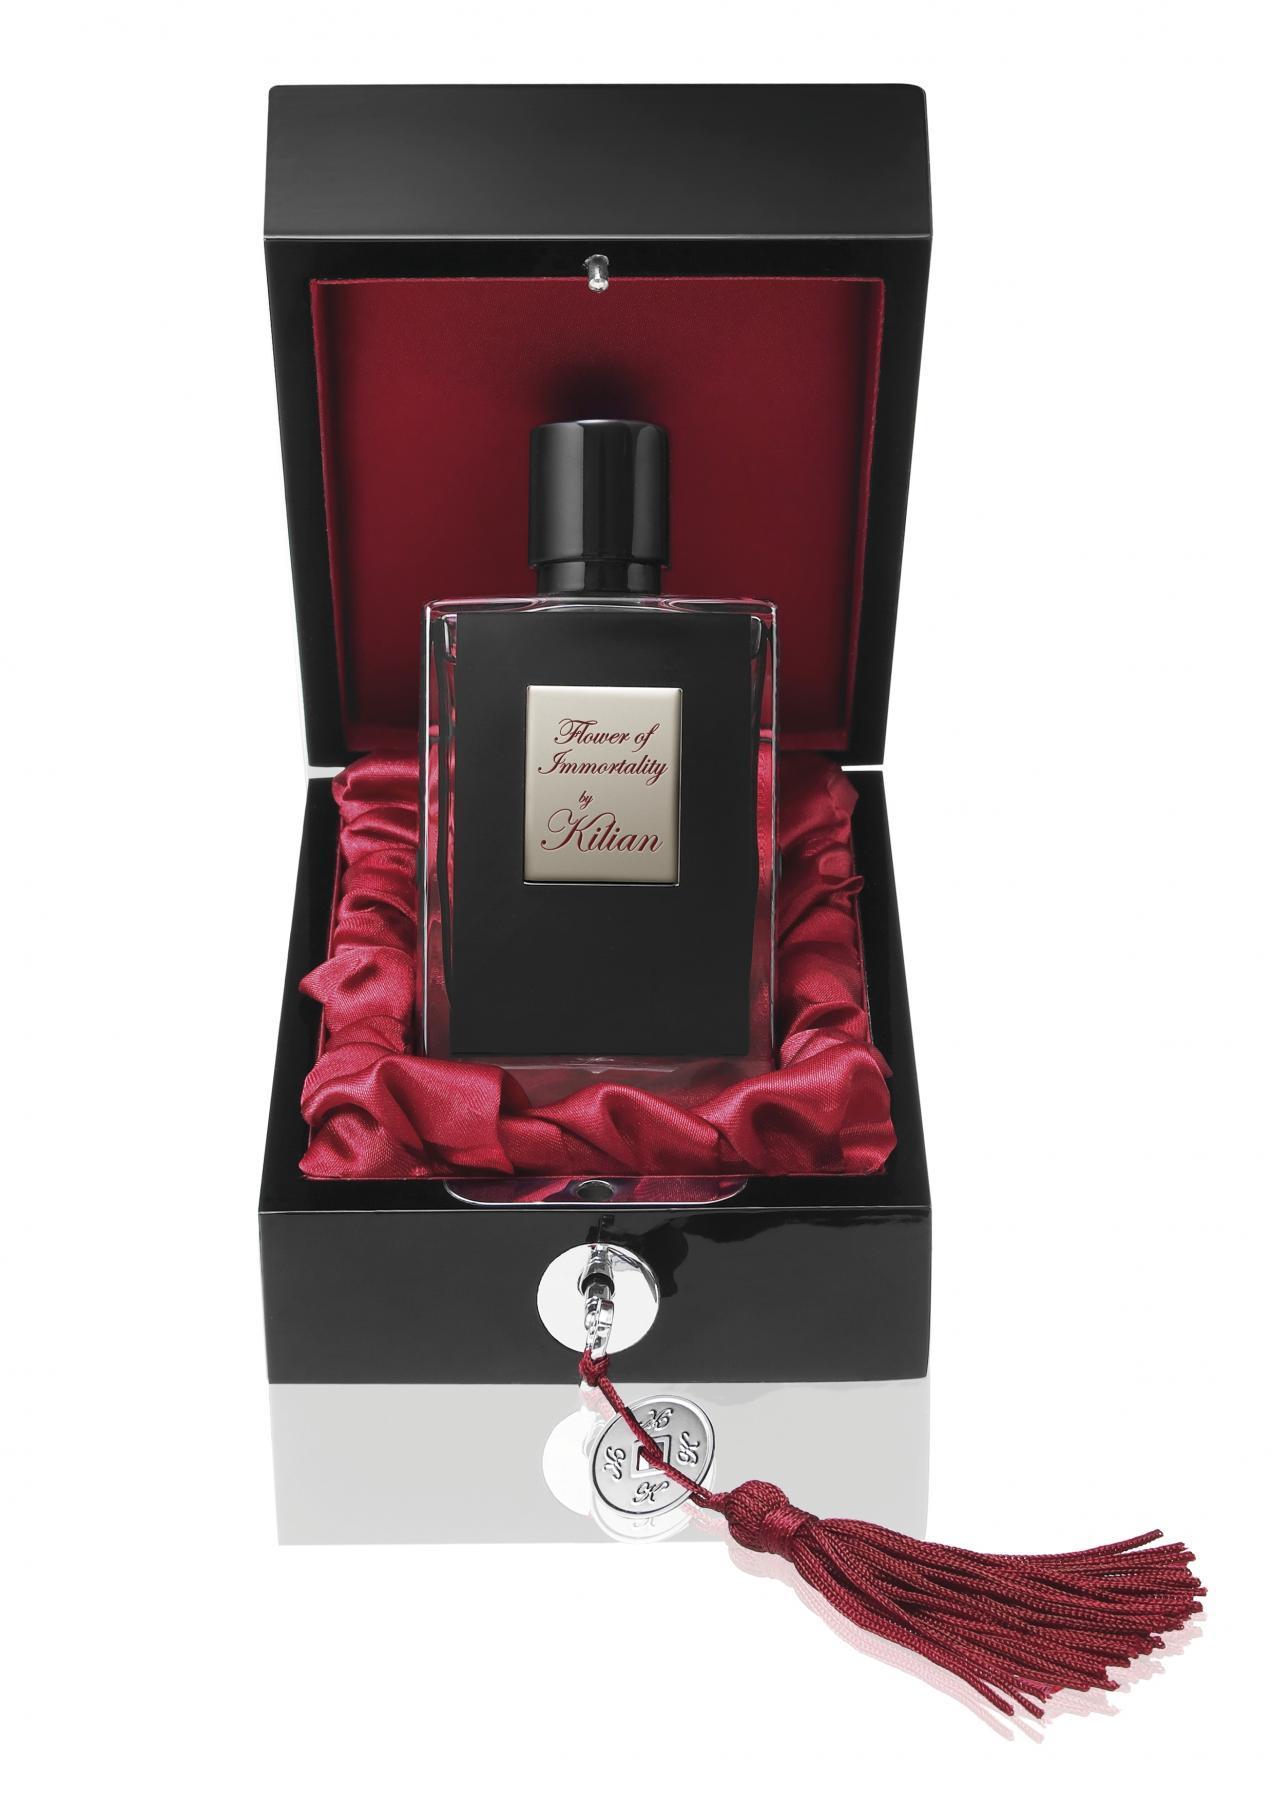 Kilian Flower of Immortality Eau De Parfum